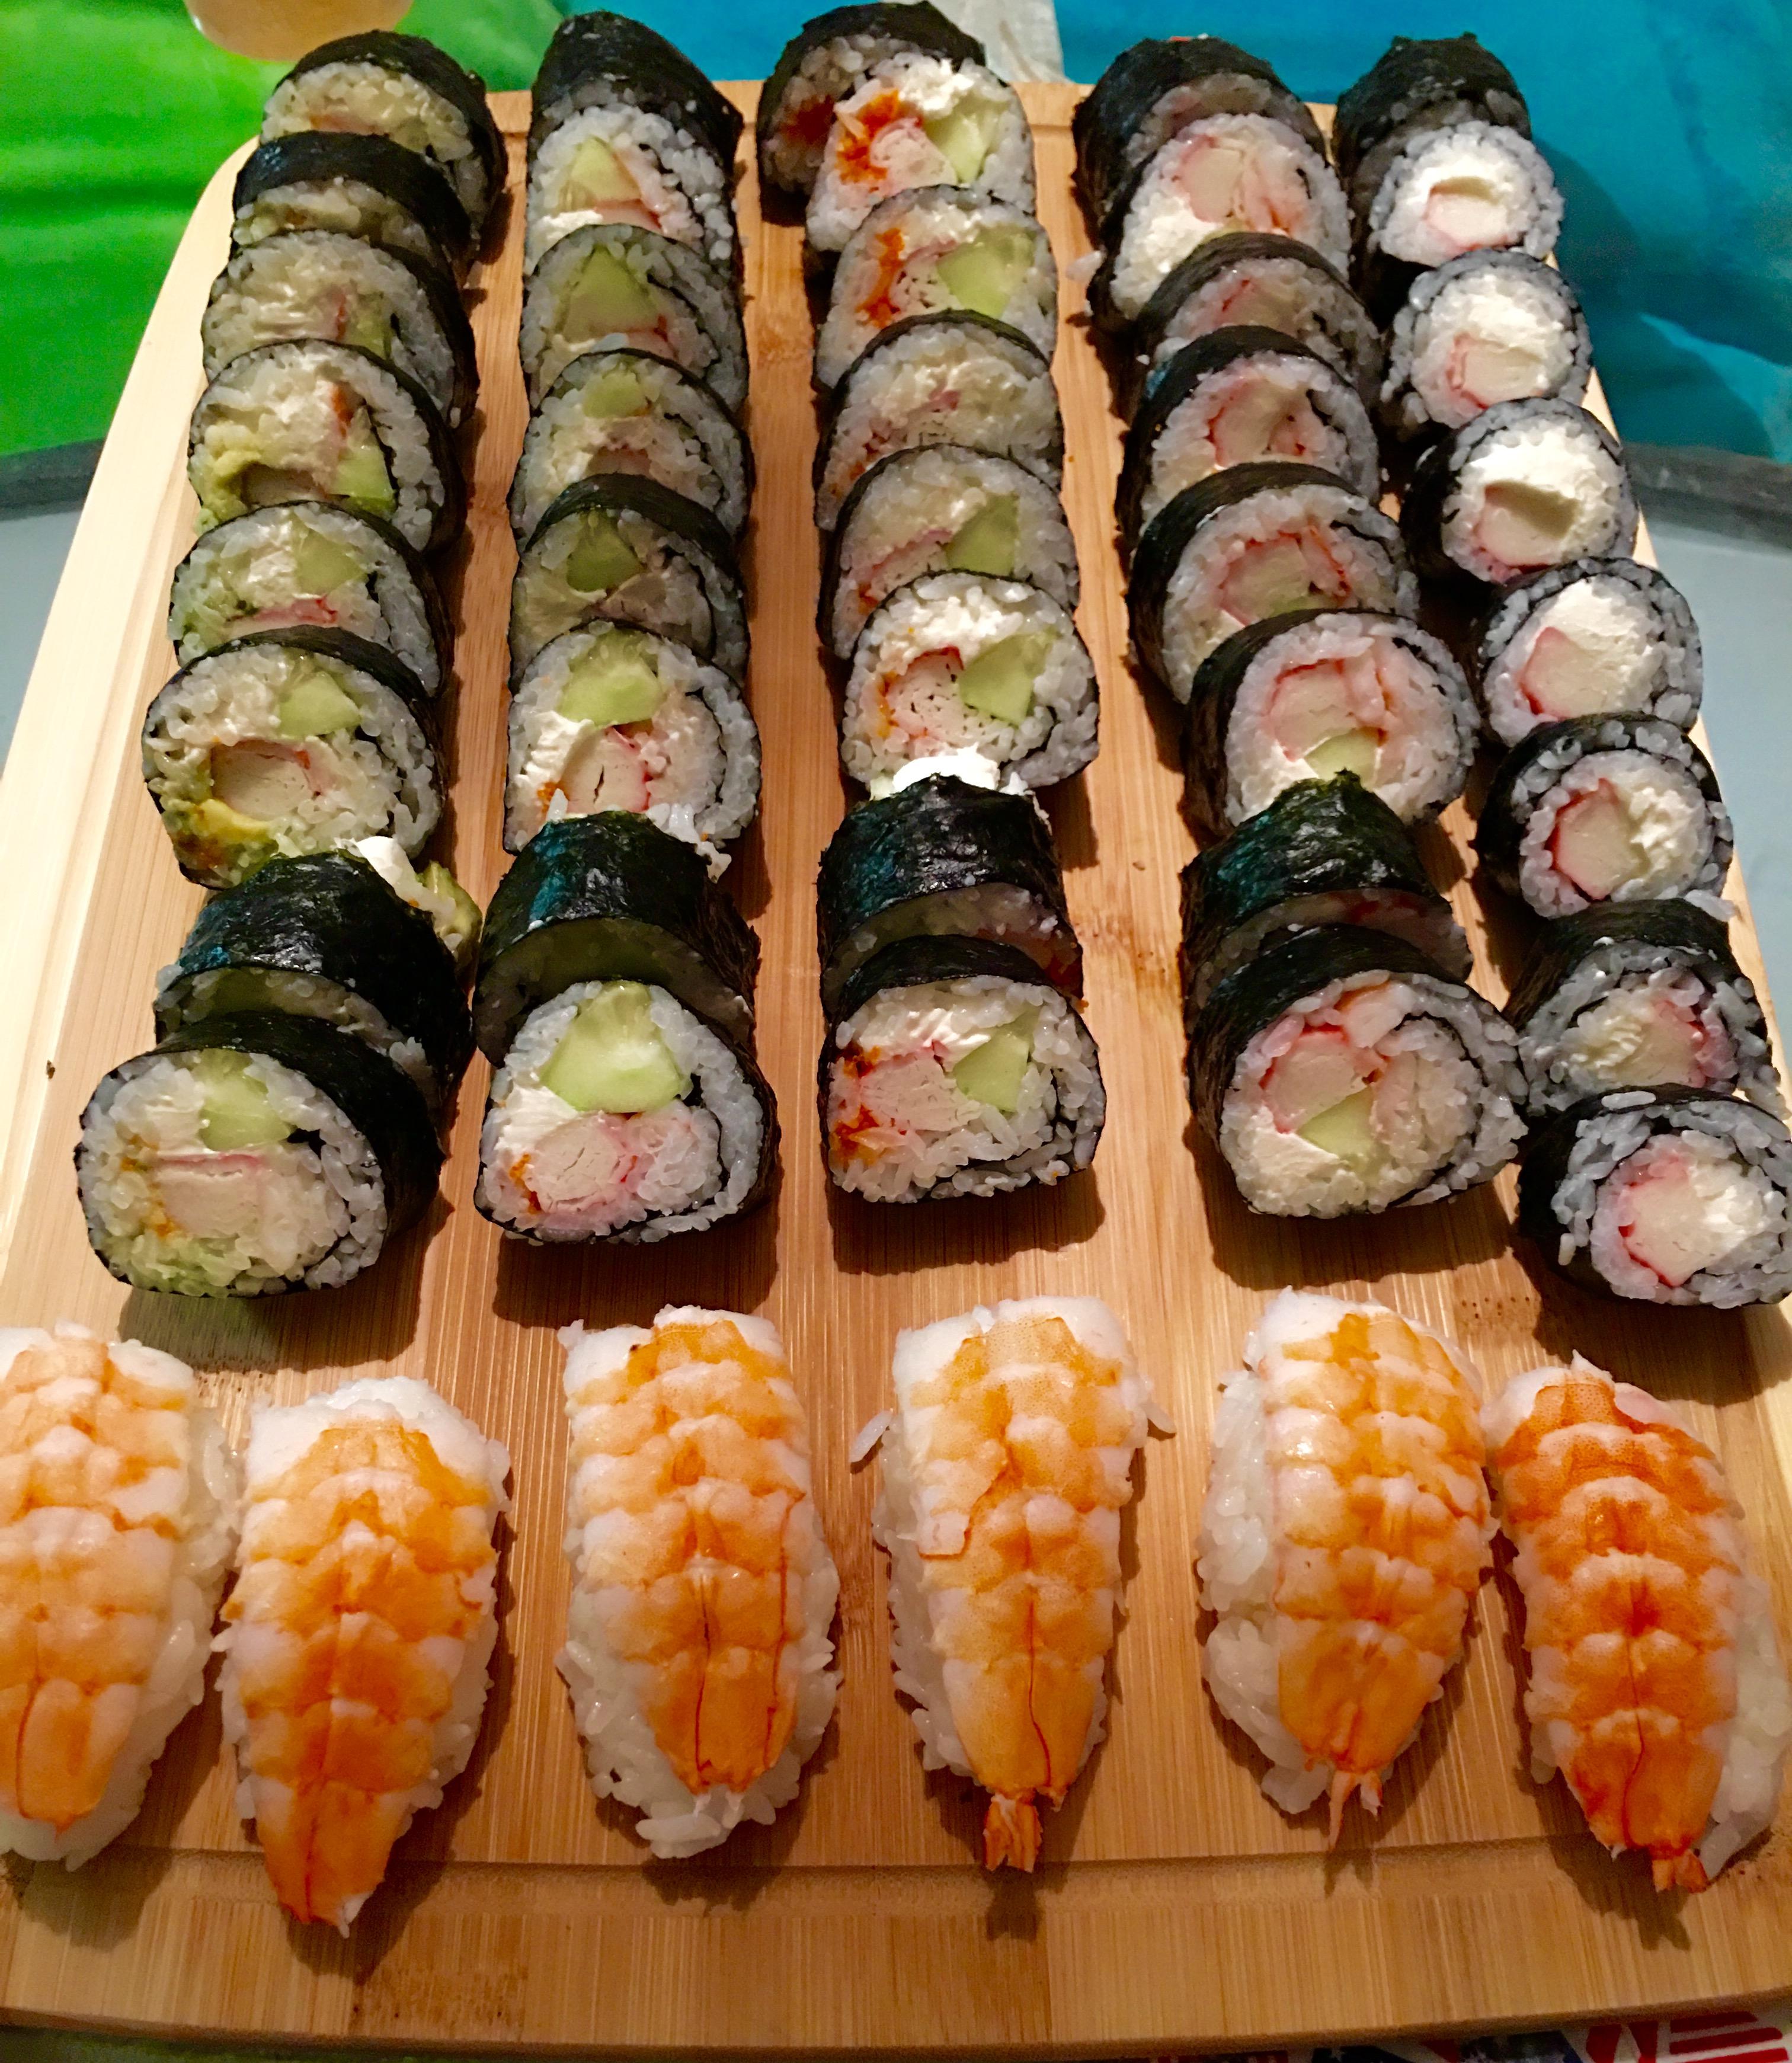 Sushi Creation at Home